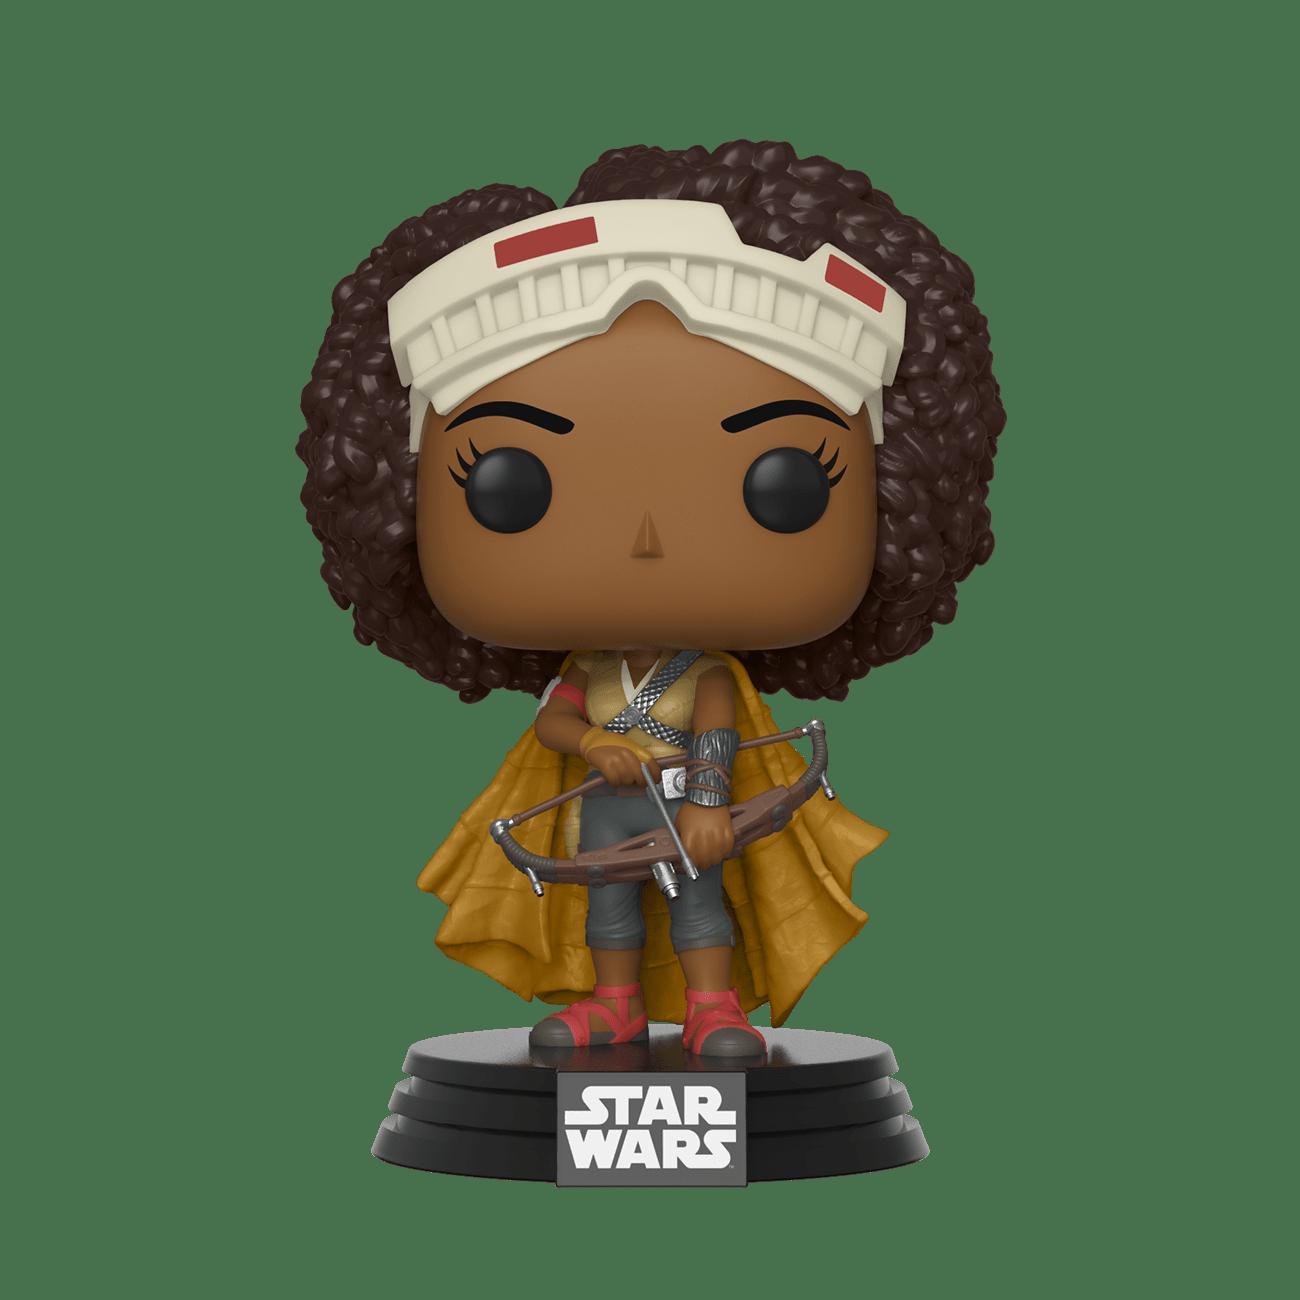 Funko Star Wars: The Rise of Skywalker Jannah Pop!  Vinyl Figure